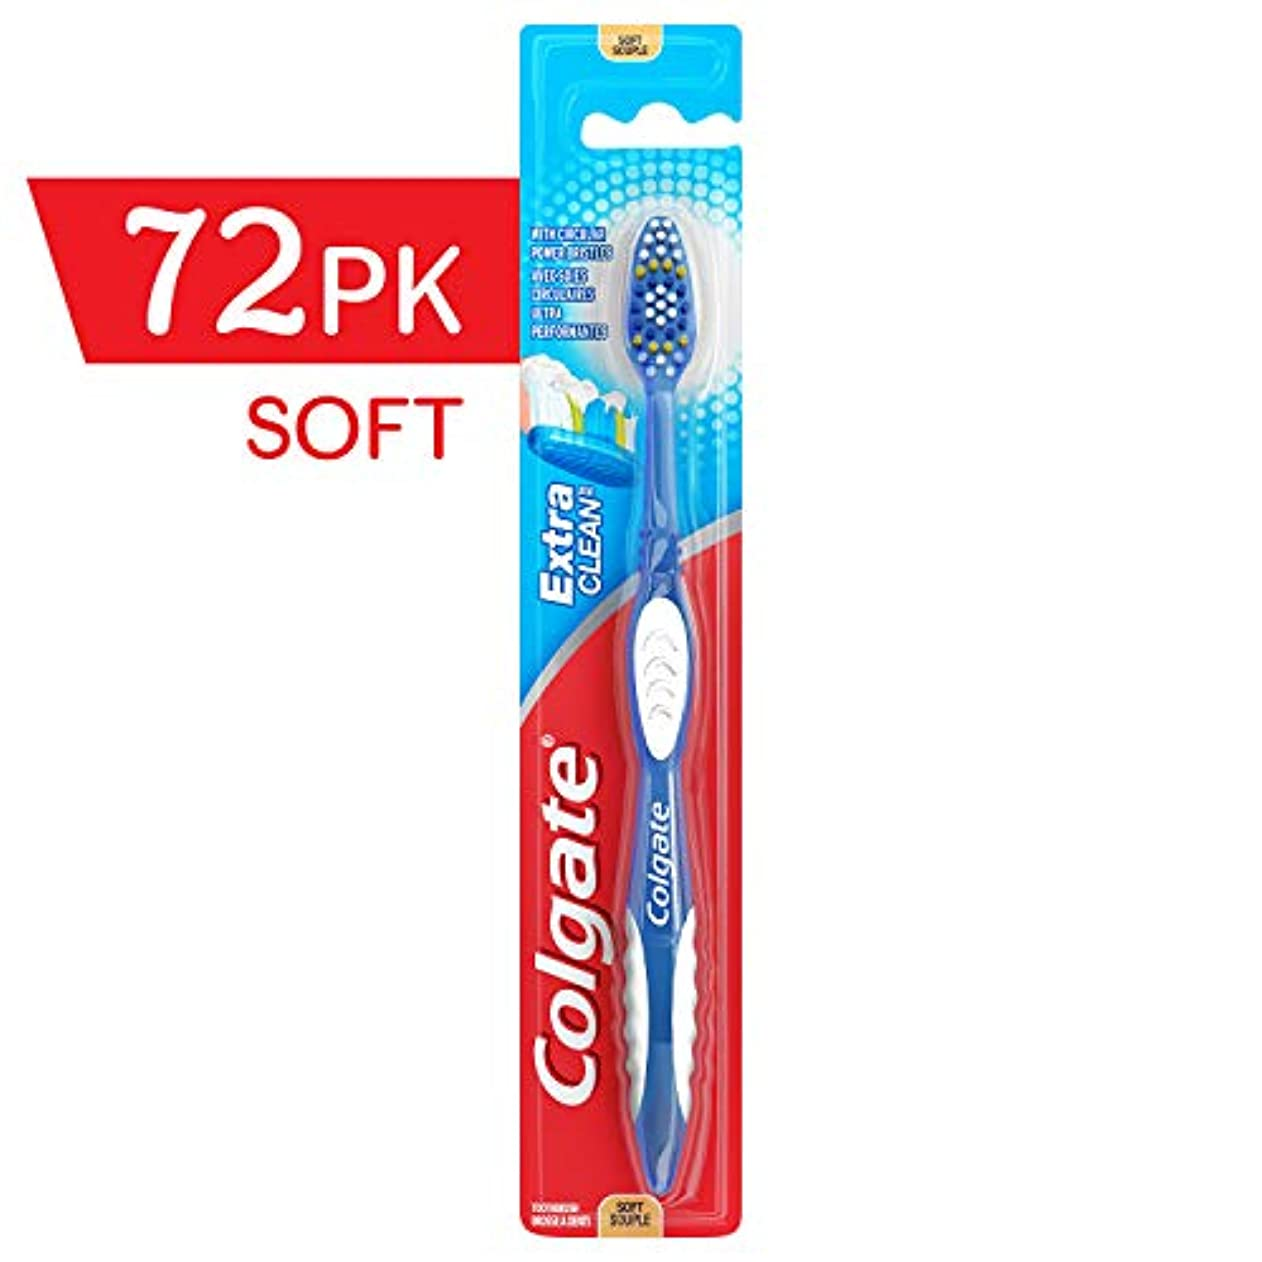 Colgate エクストラクリーン歯ブラシソフト、柔らかい歯ブラシ、バルク歯ブラシ、旅行歯ブラシ、(72の場合)(モデル番号:155676)